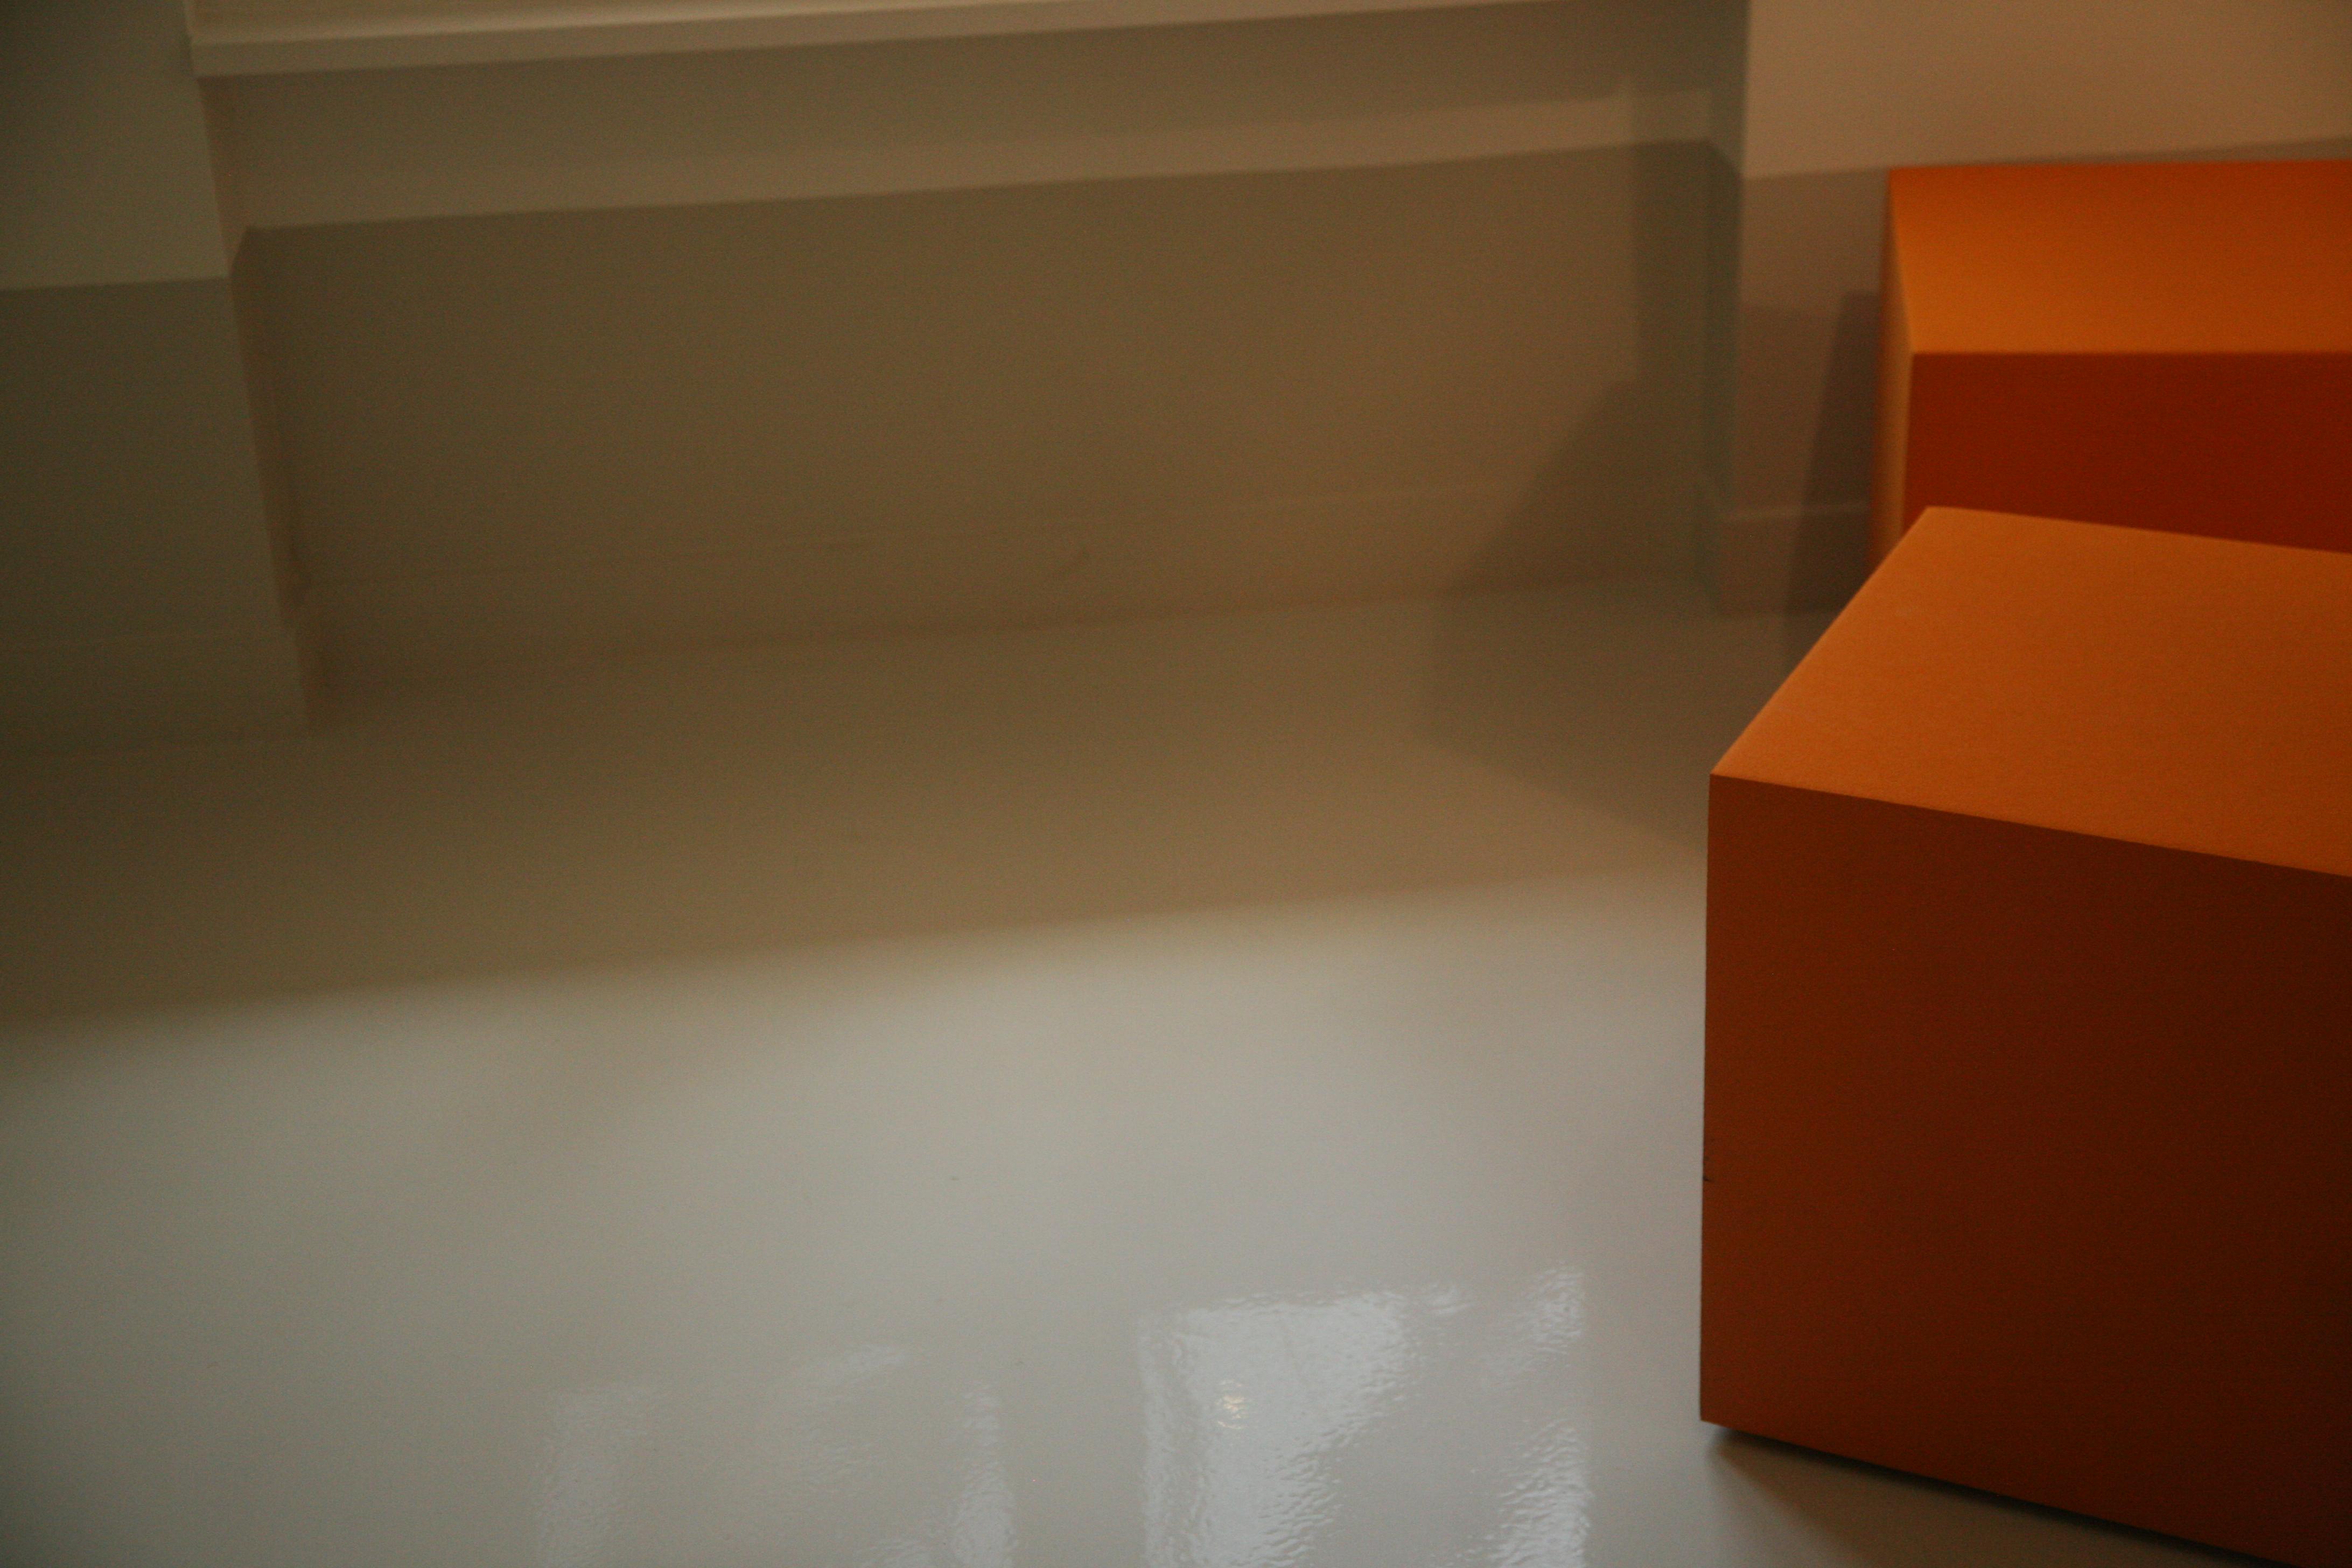 utopia furniture. Free Images : Architecture, Wood, House, Floor, Wall, Social, Color, Furniture, Room, Apartment, Interior Design, Arquitectura, Graphic, Utopia, Graphisme, Utopia Furniture